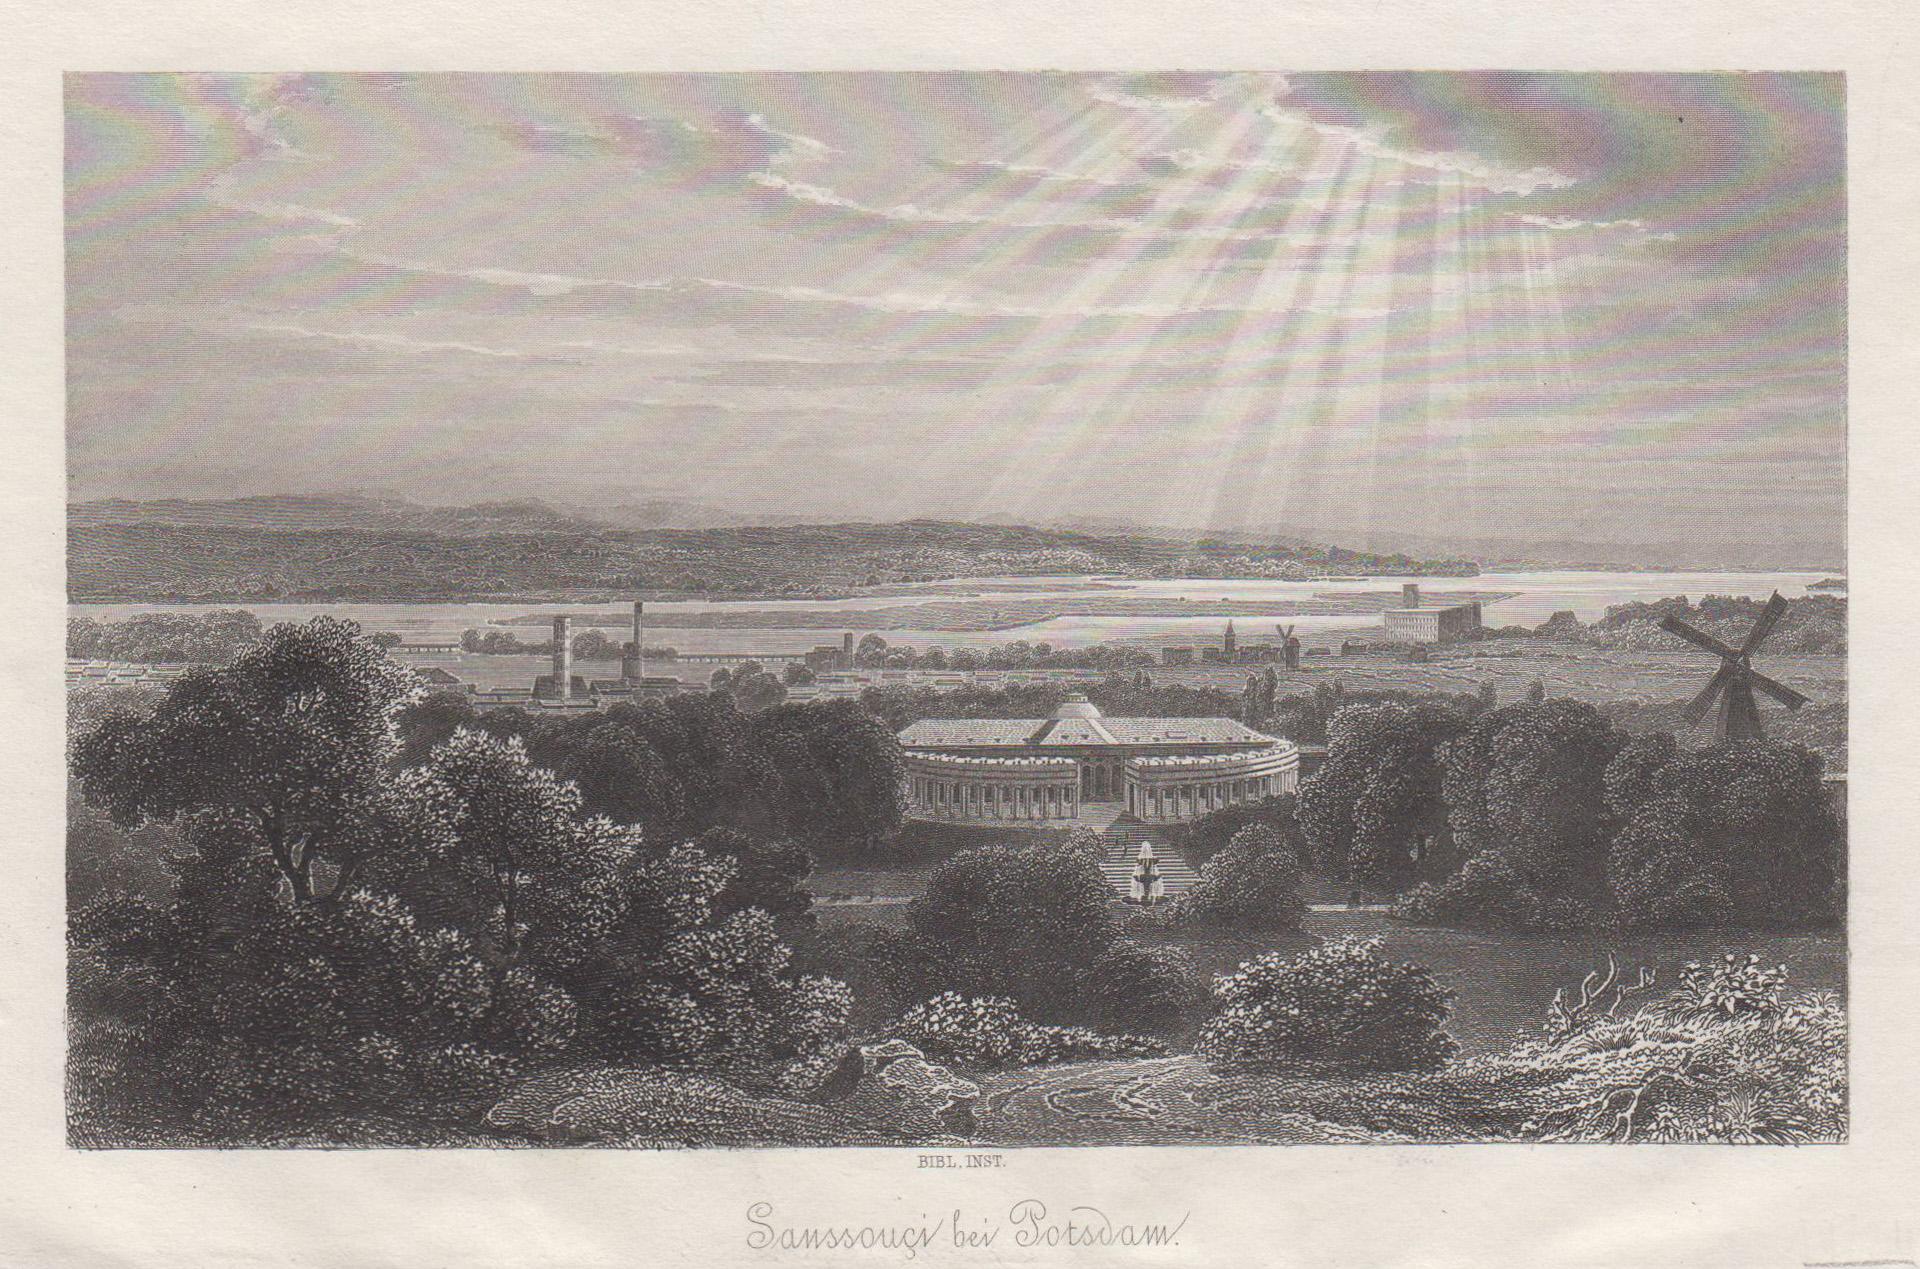 Blick vom Ruinenberg auf das Schloss, i.: Potsdam - Schloss